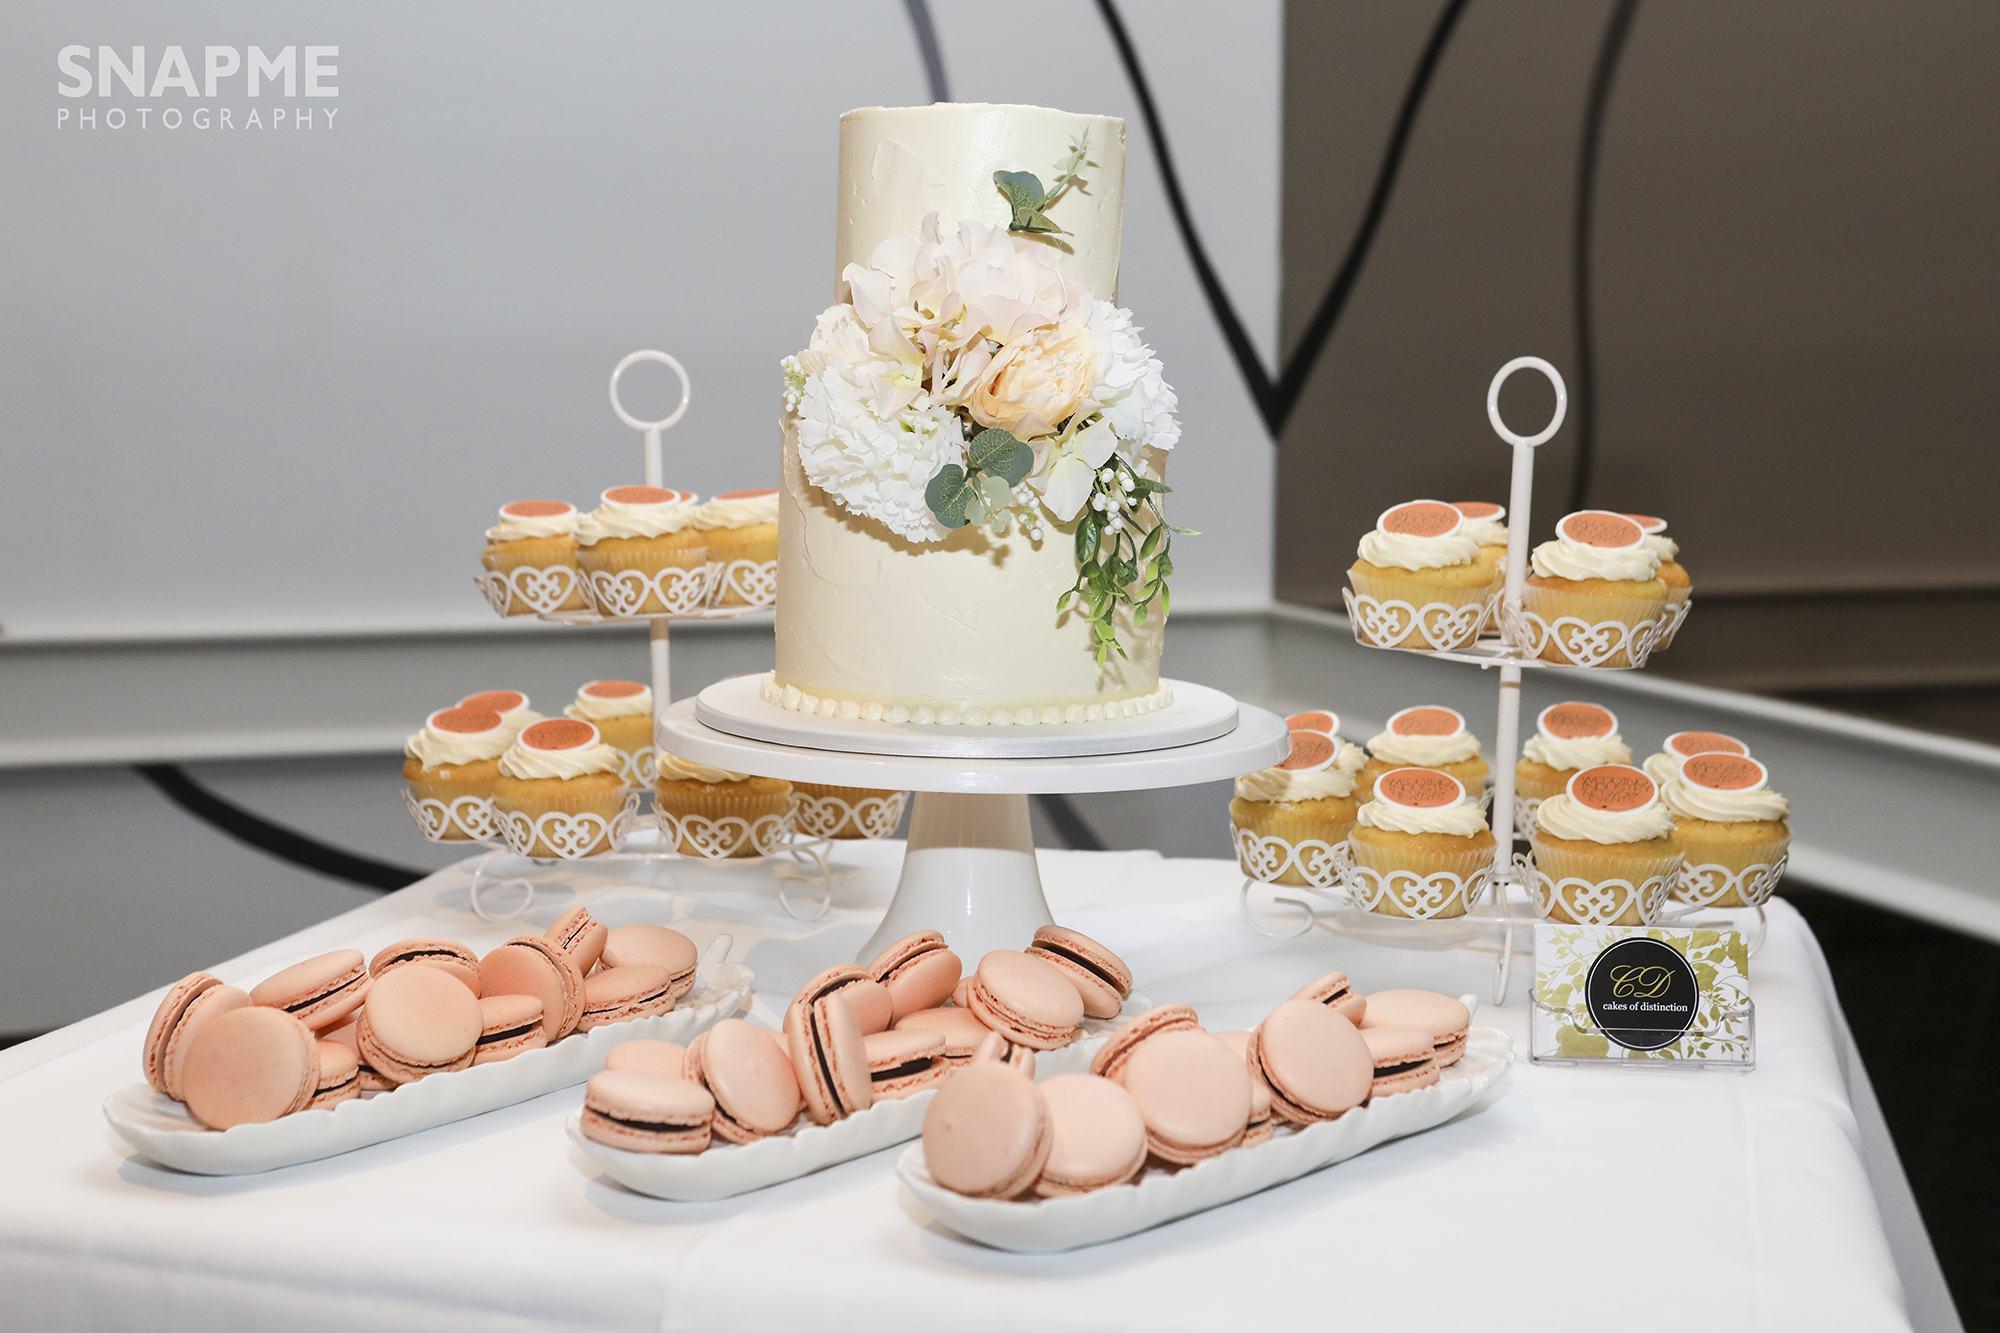 cakesofdistinction